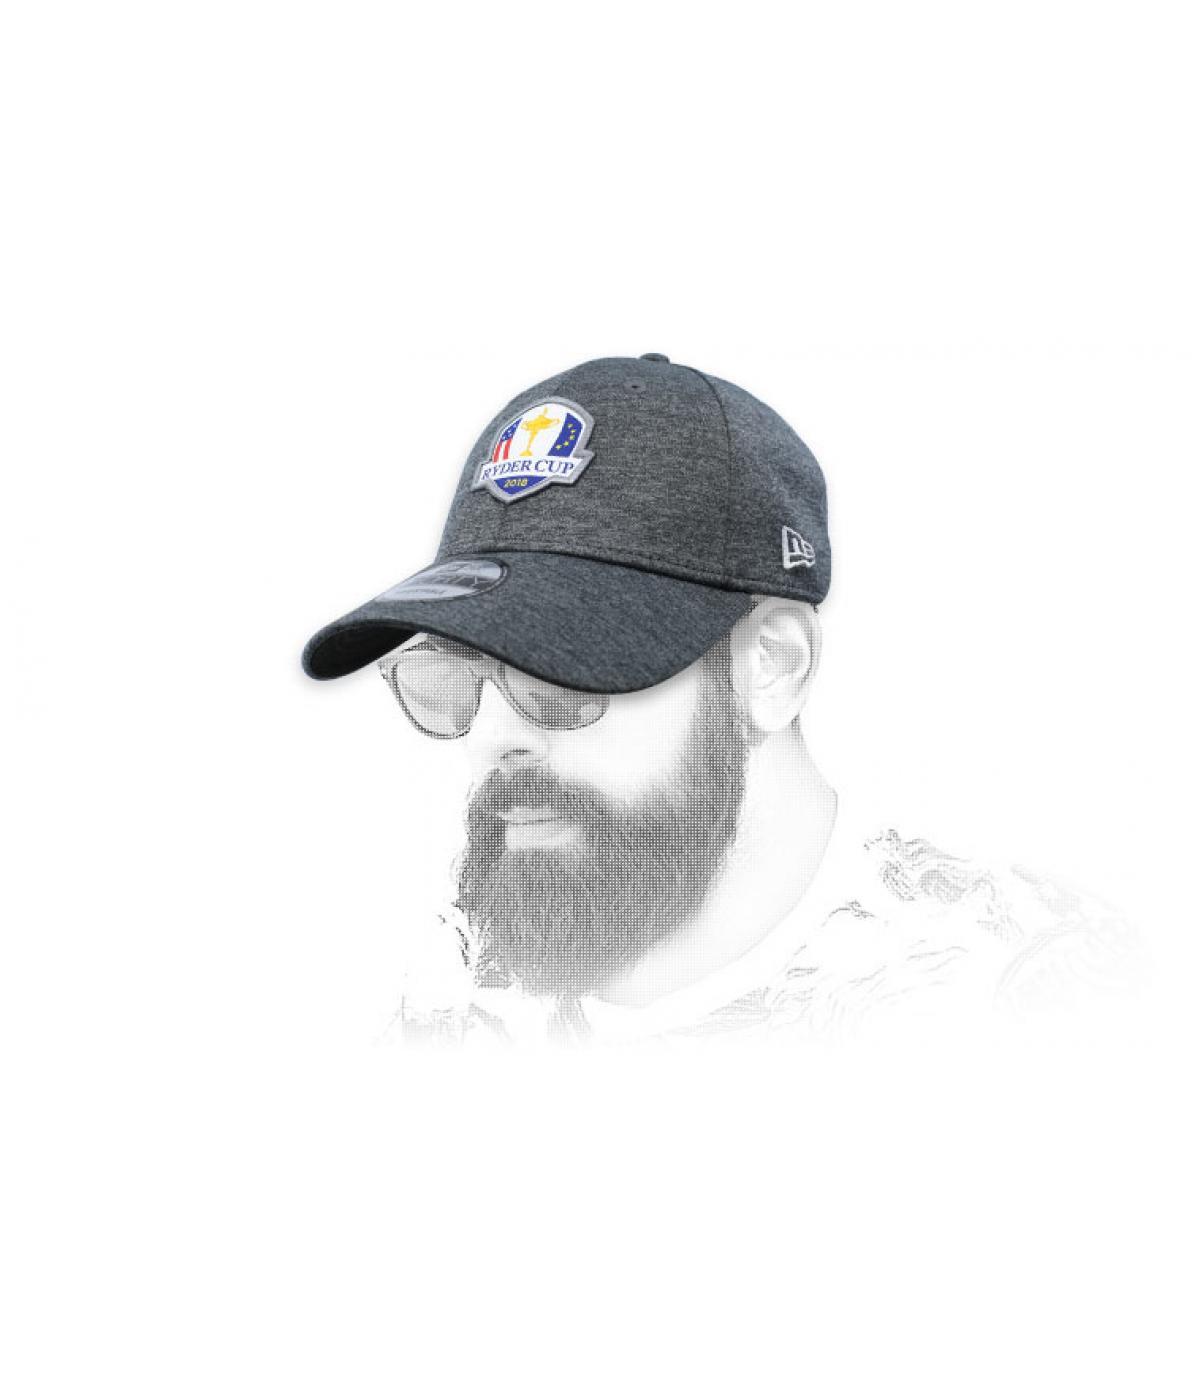 grey Ryder Cup golf cap